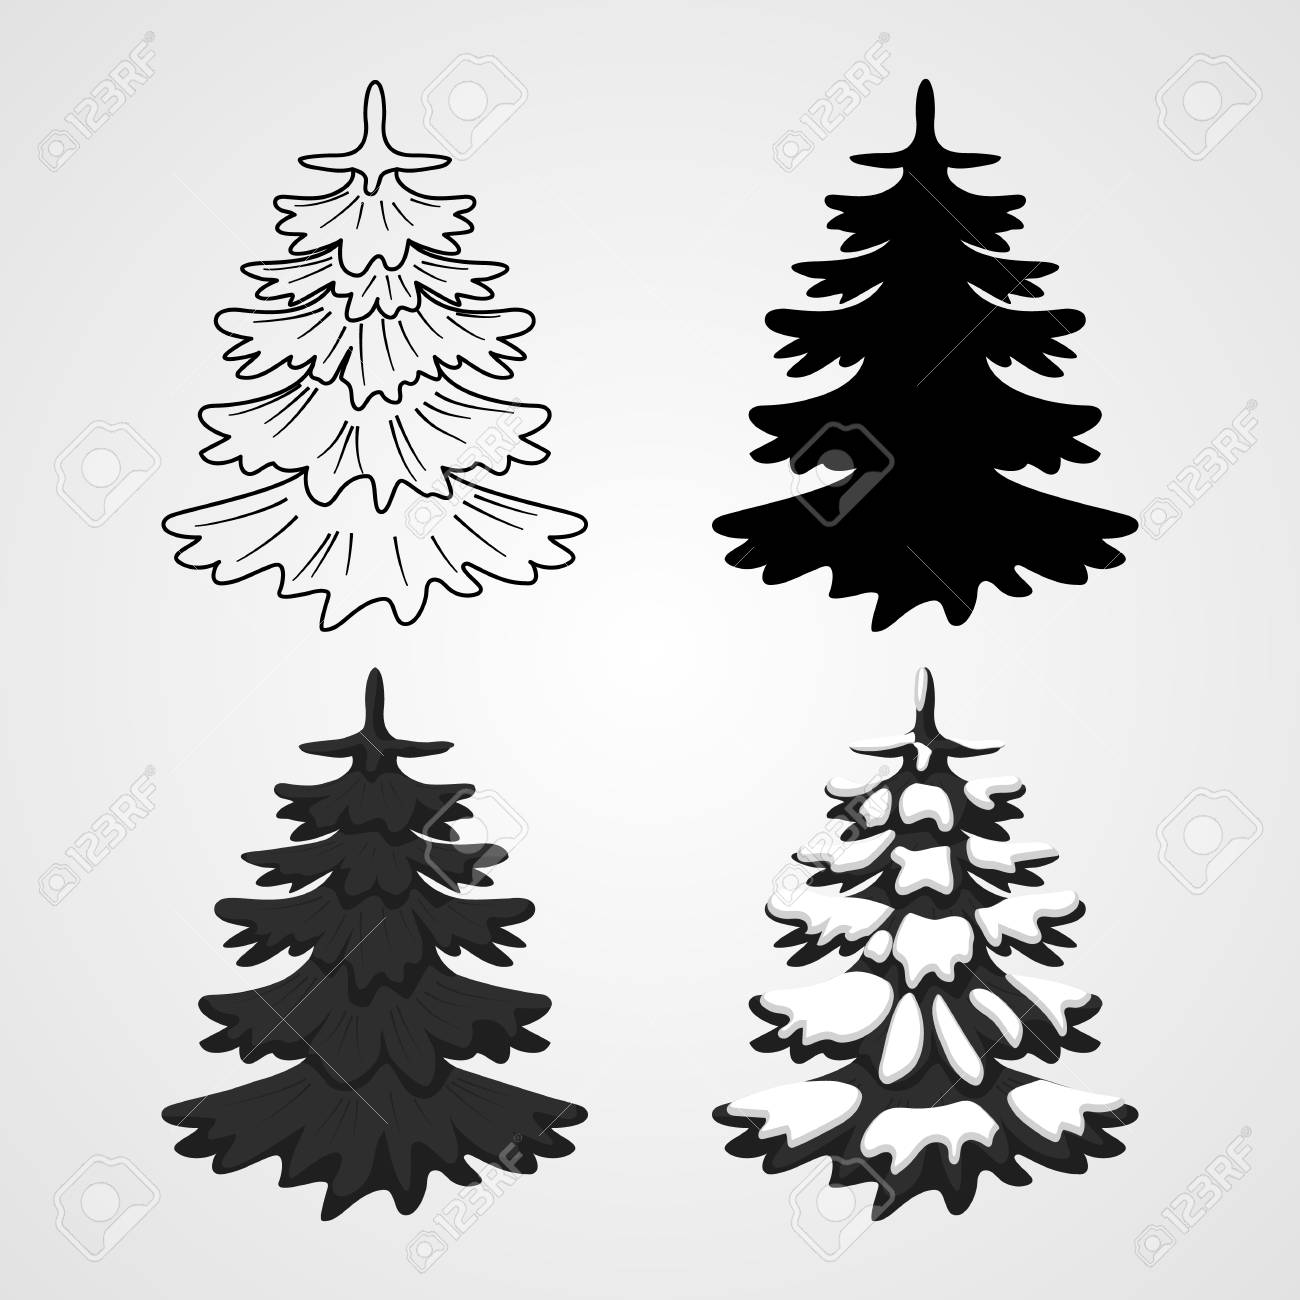 Illustration Set Icons Of Christmas Trees Contour Silhouette